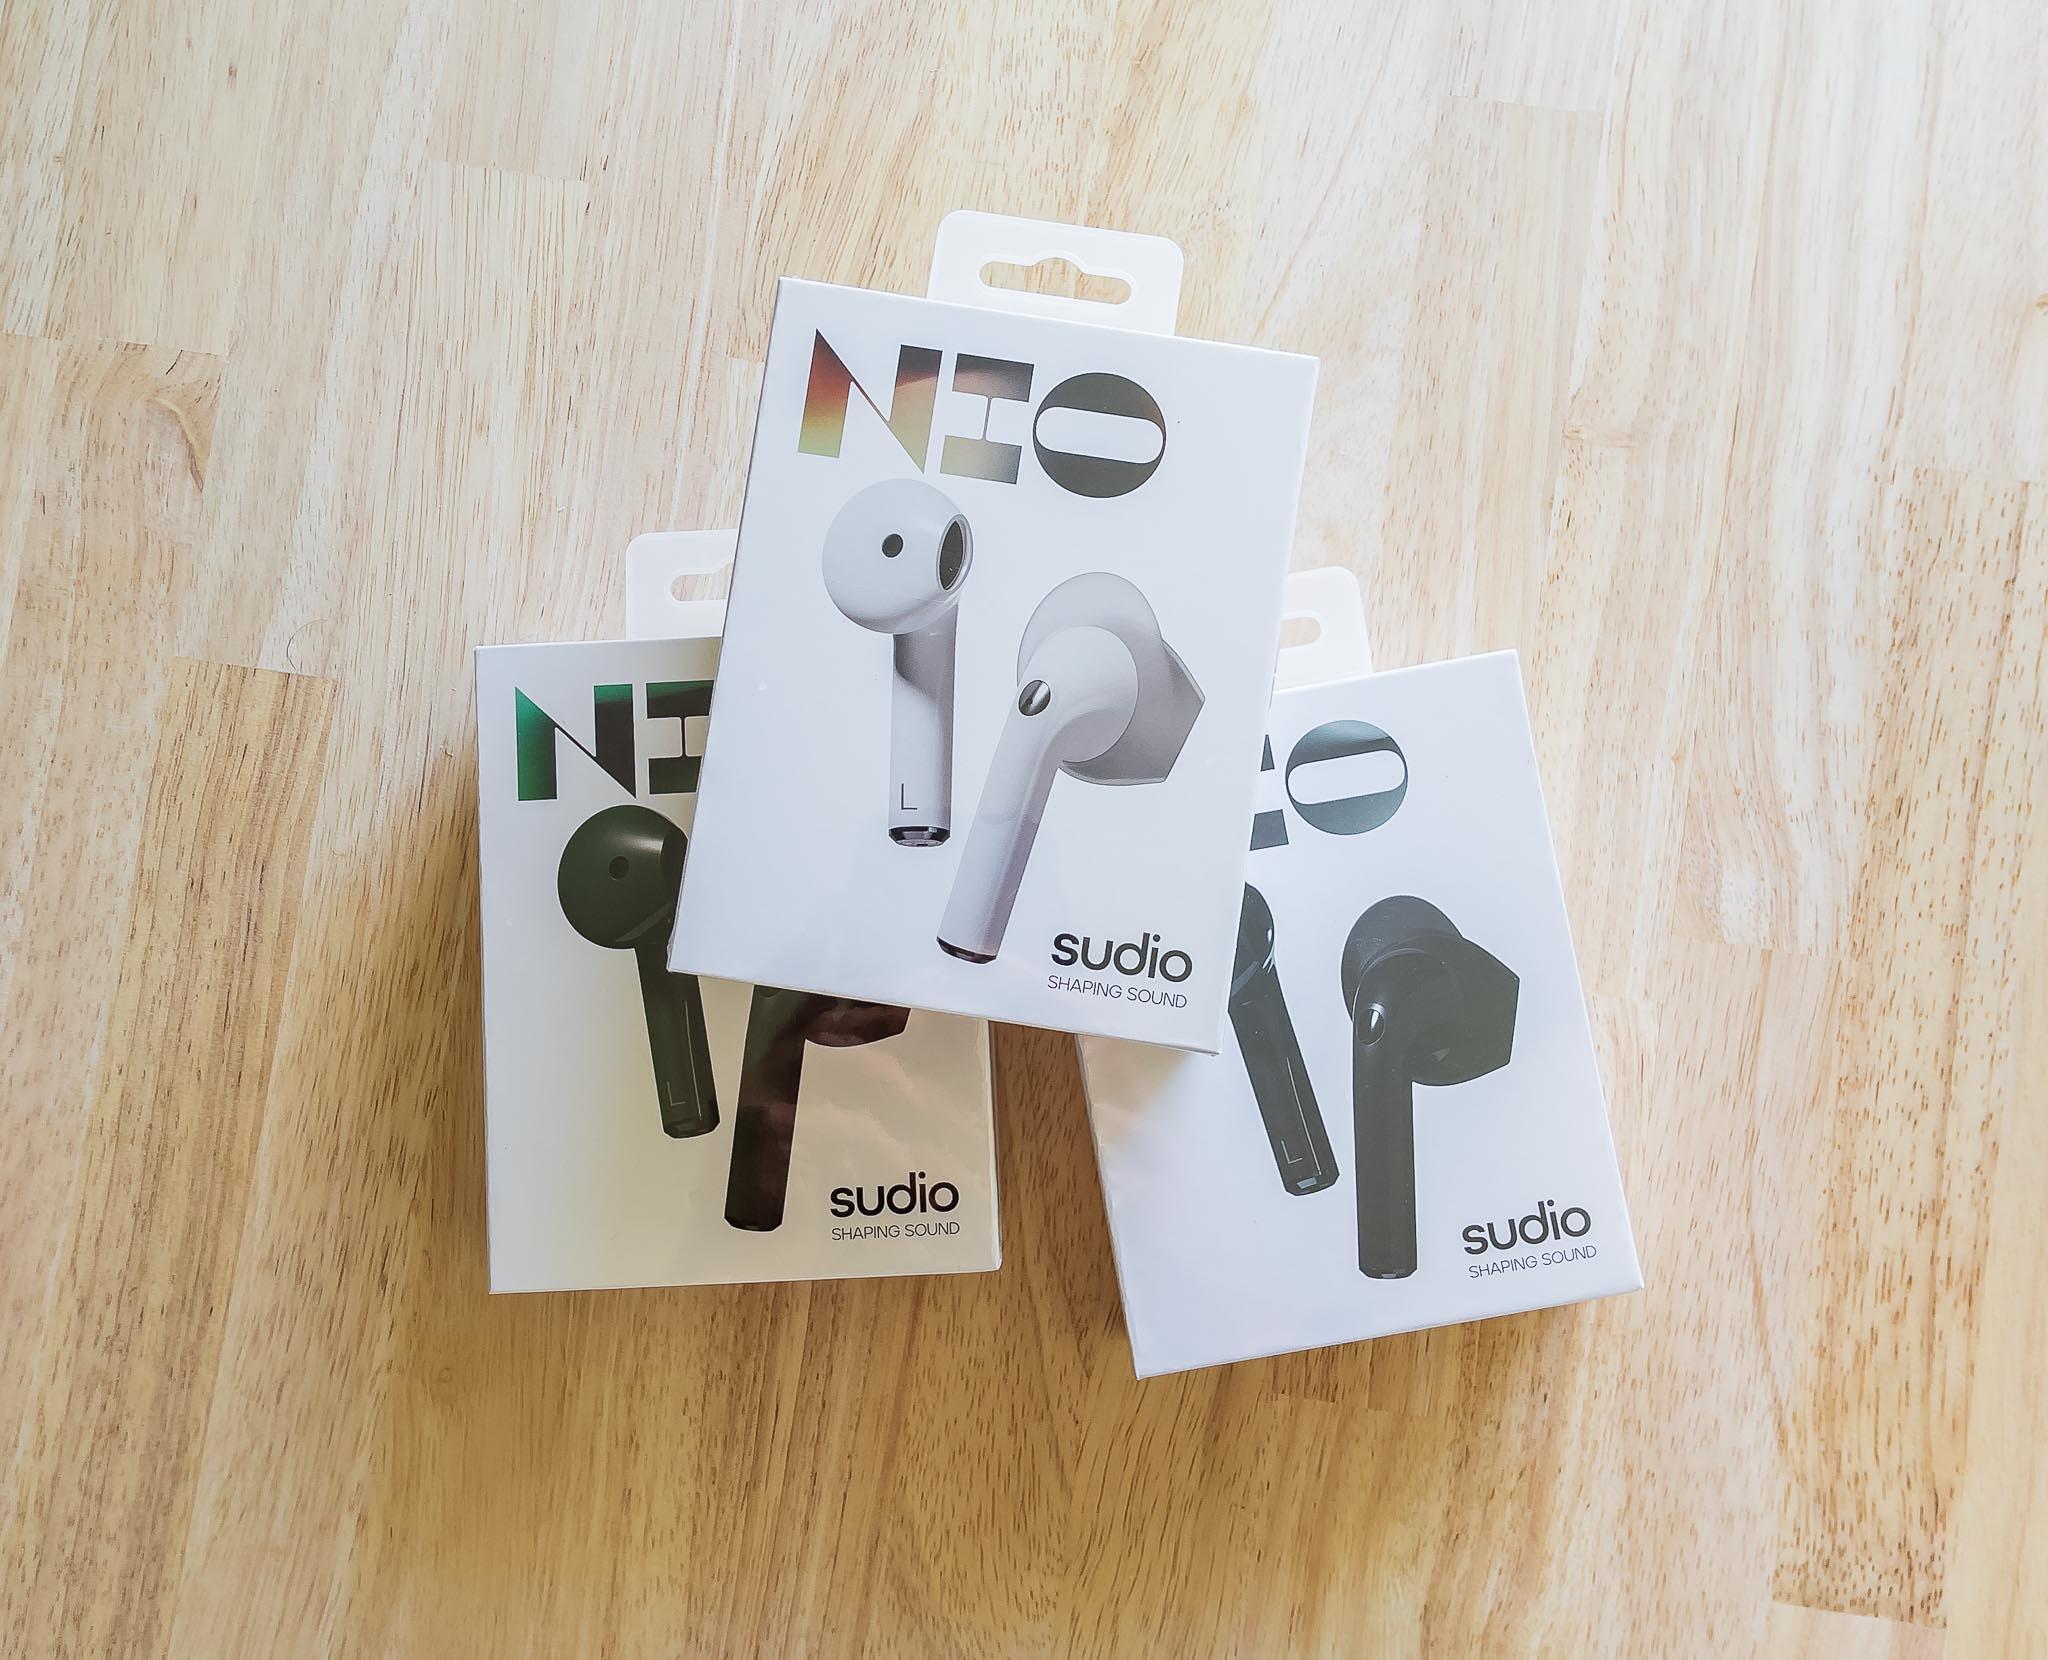 Packaging Sudio Nio